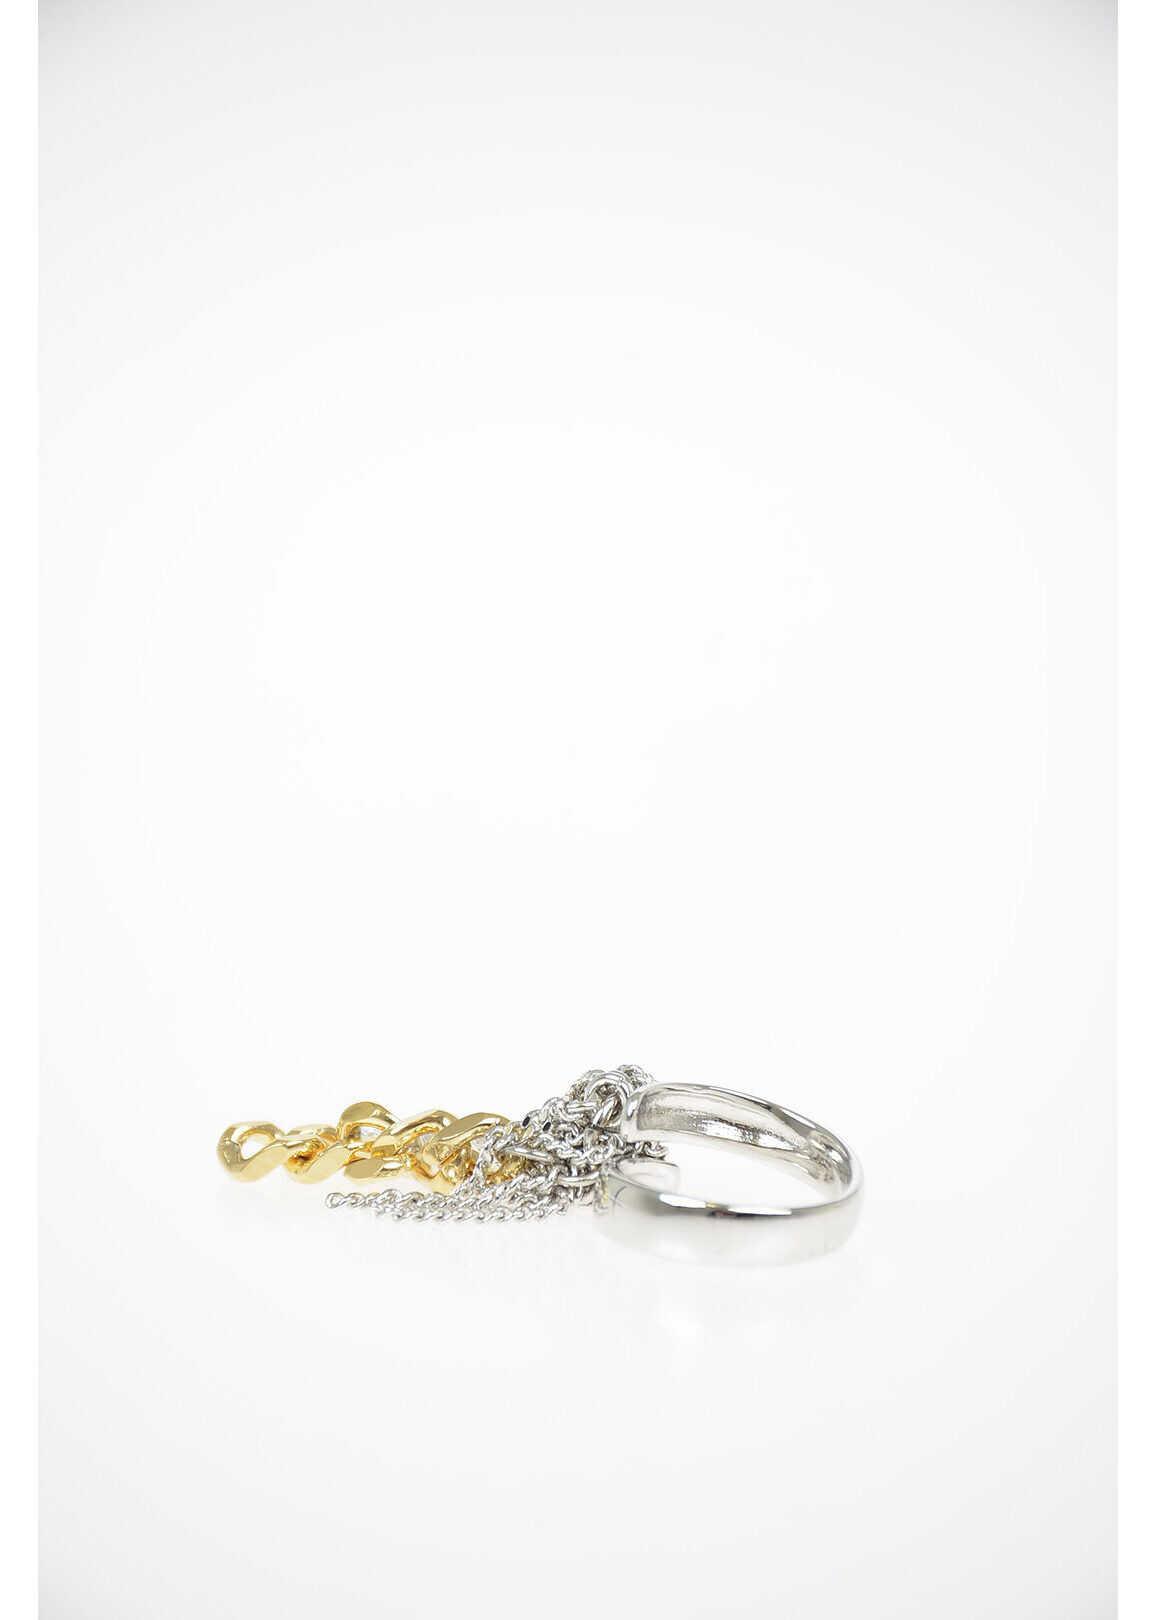 Maison Margiela MM6 Chain Ring SILVER